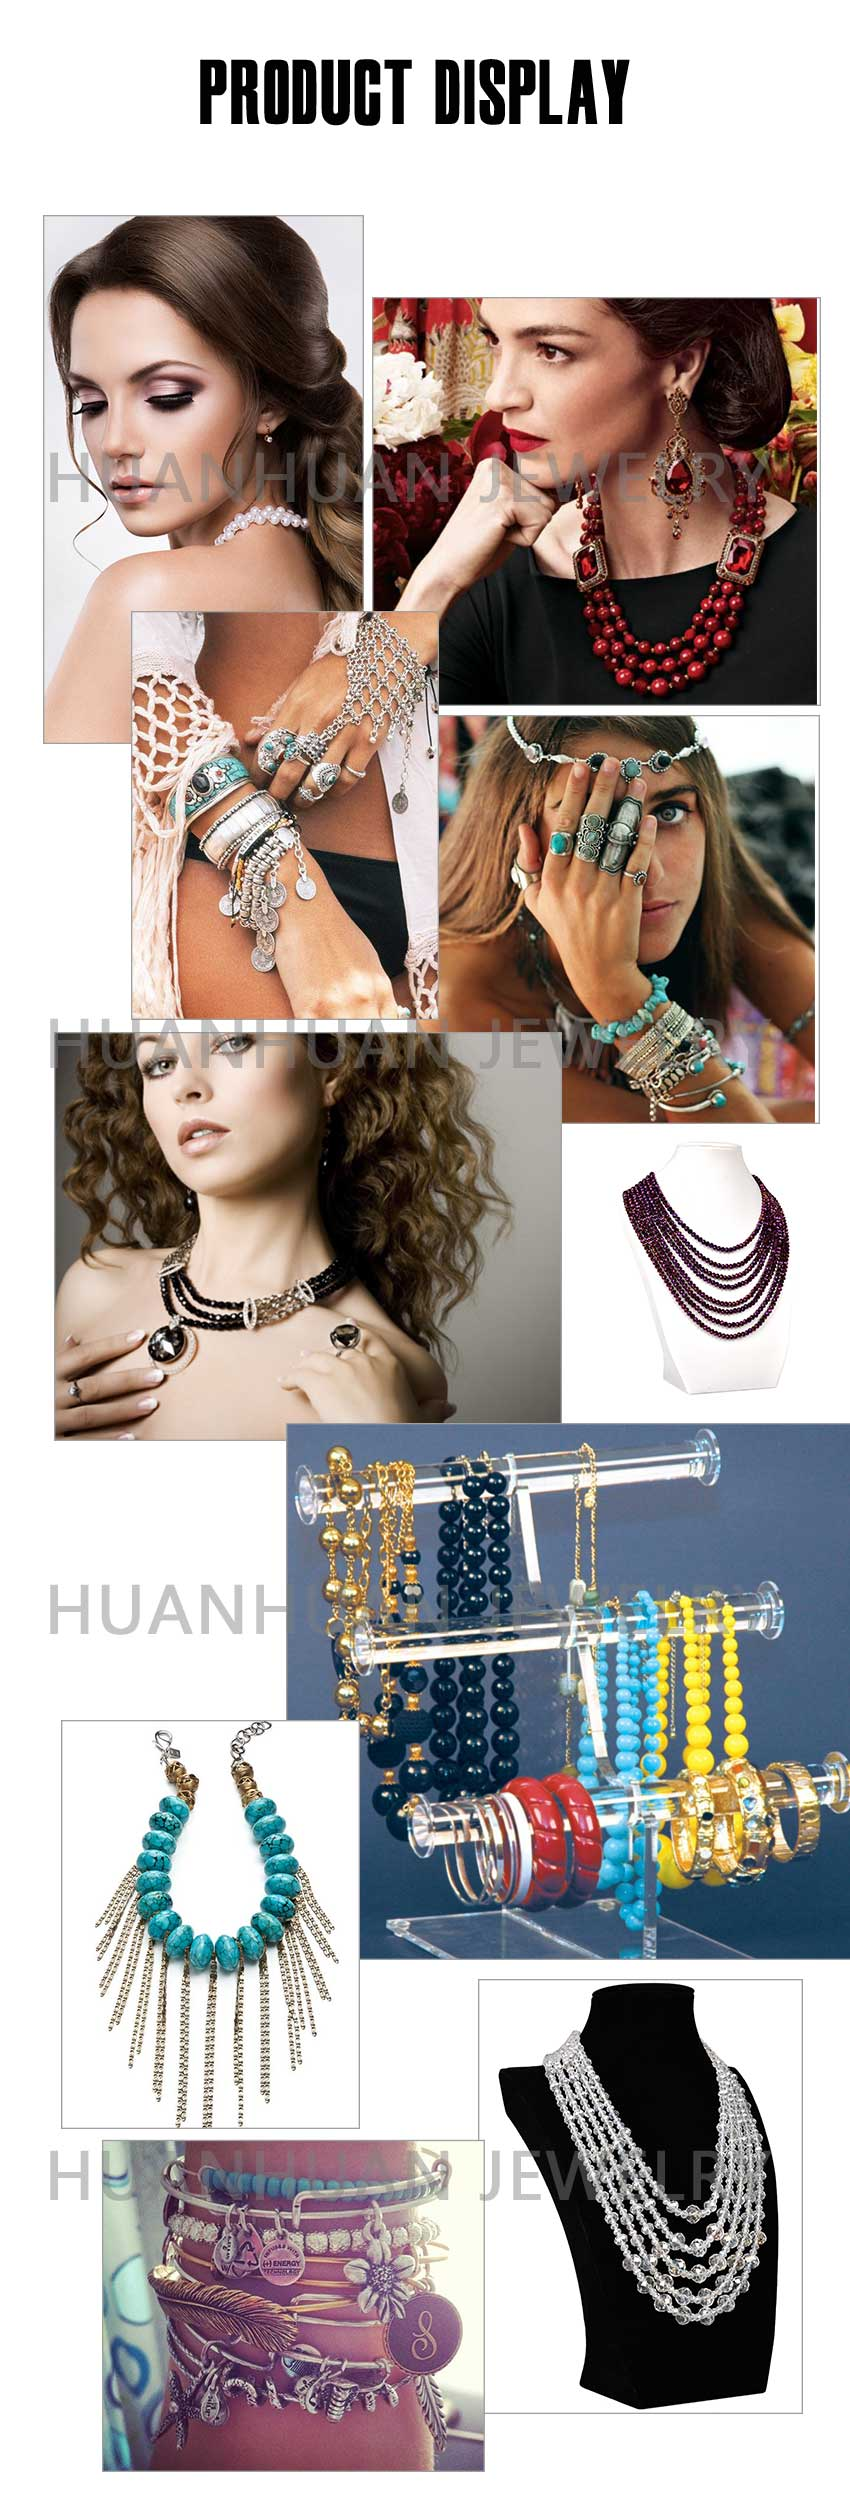 Huanhuan-jewelry_04